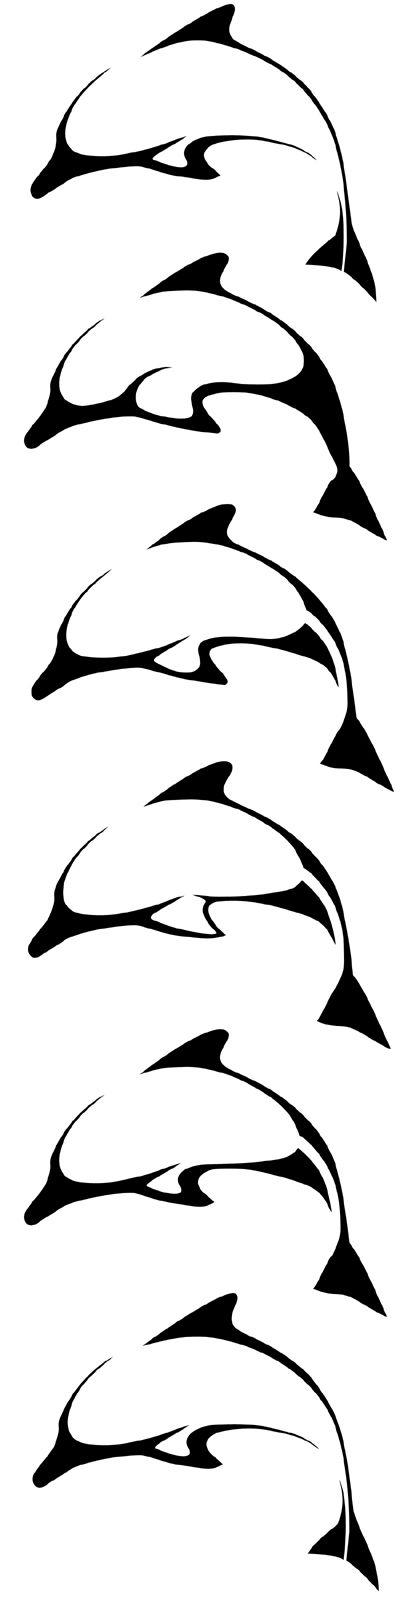 dolphins by adezj